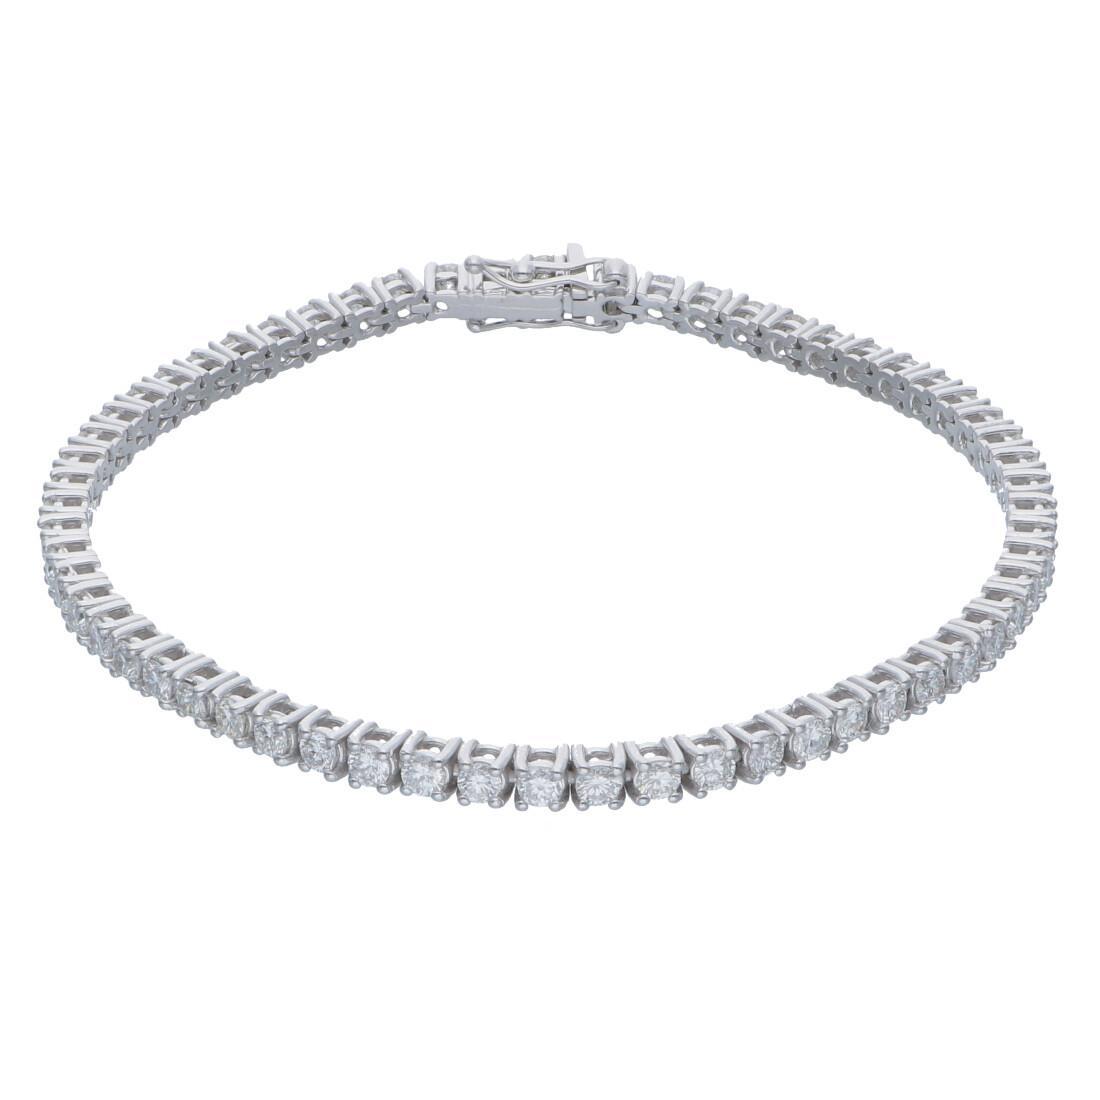 Bracciale tennis con diamanti ct 3,01 - ALFIERI & ST. JOHN